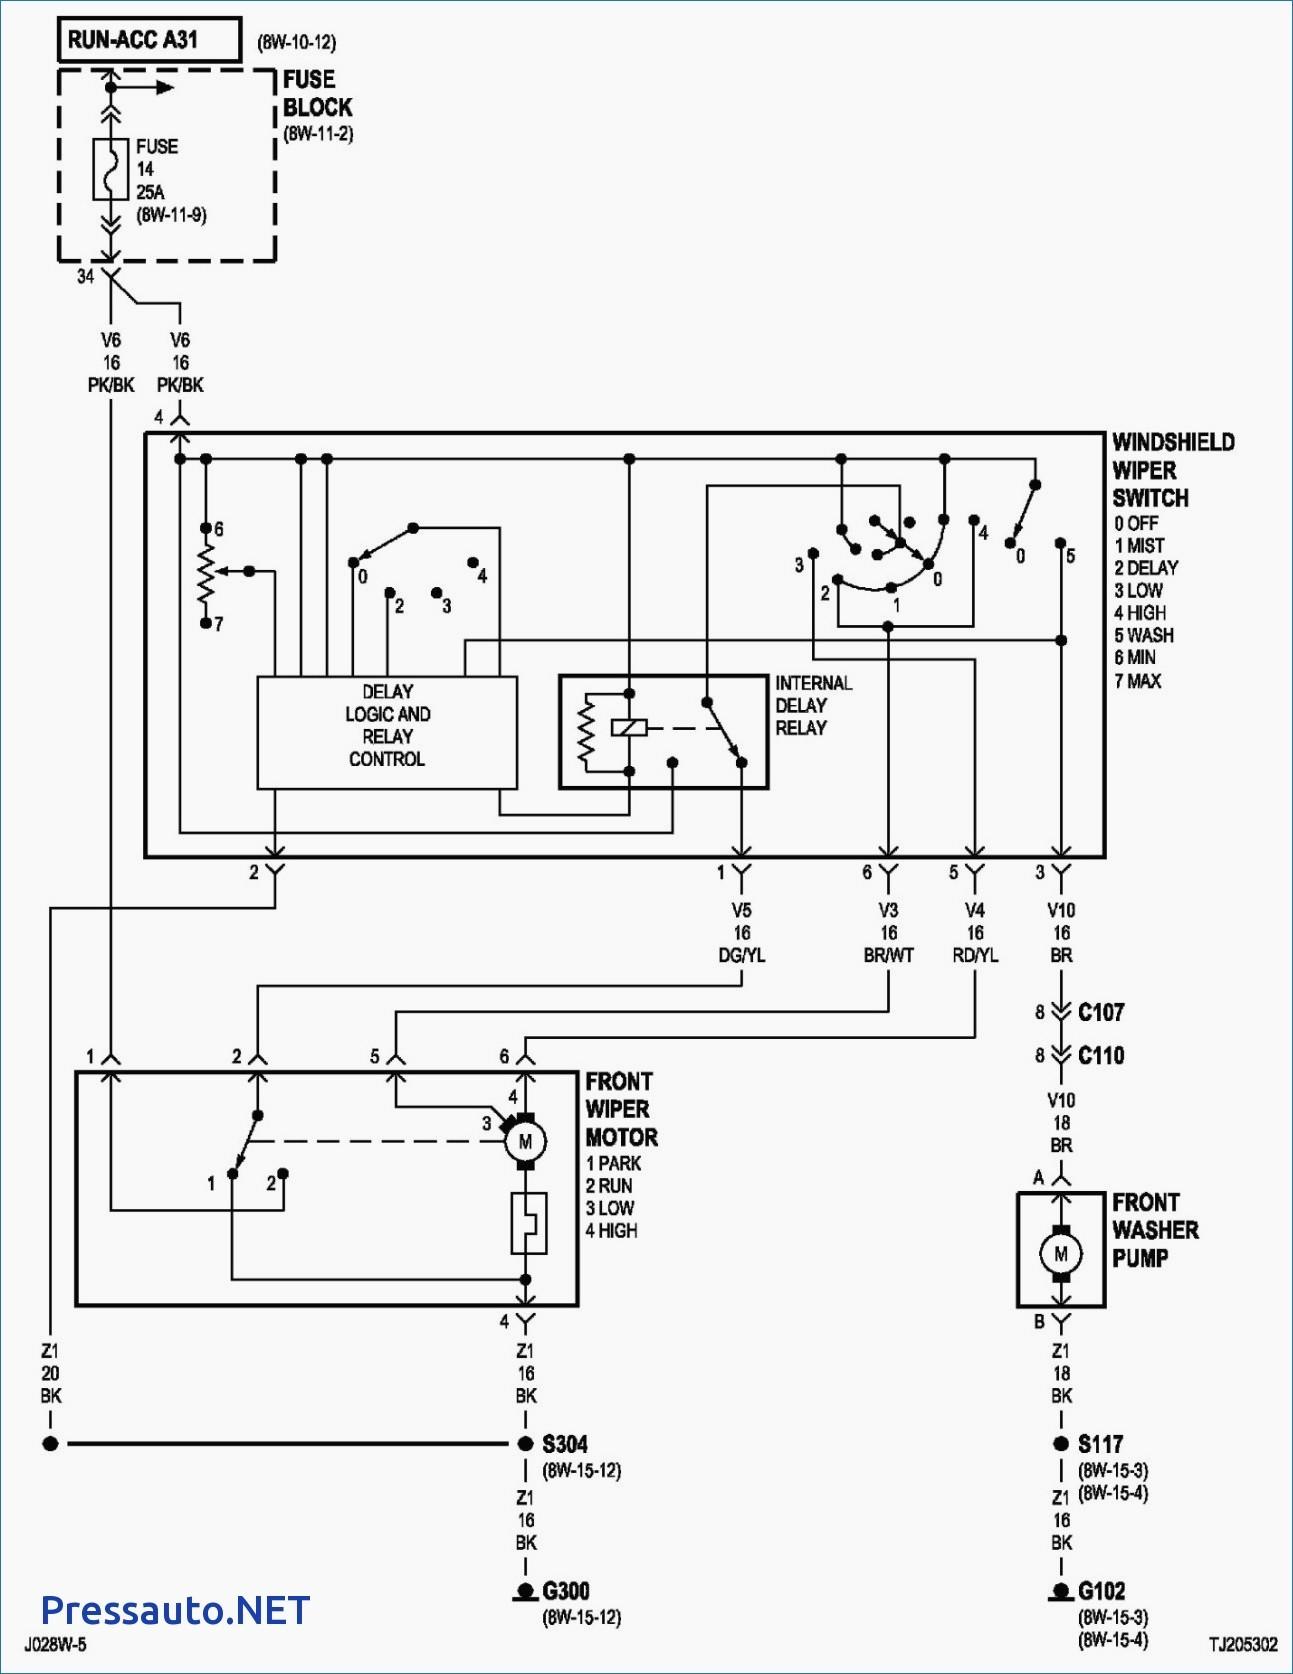 Jeep Wrangler Radio Wiring Diagram Jeep Wrangler Stereo Wiring Diagram Wiring Schematics Diagram Of Jeep Wrangler Radio Wiring Diagram